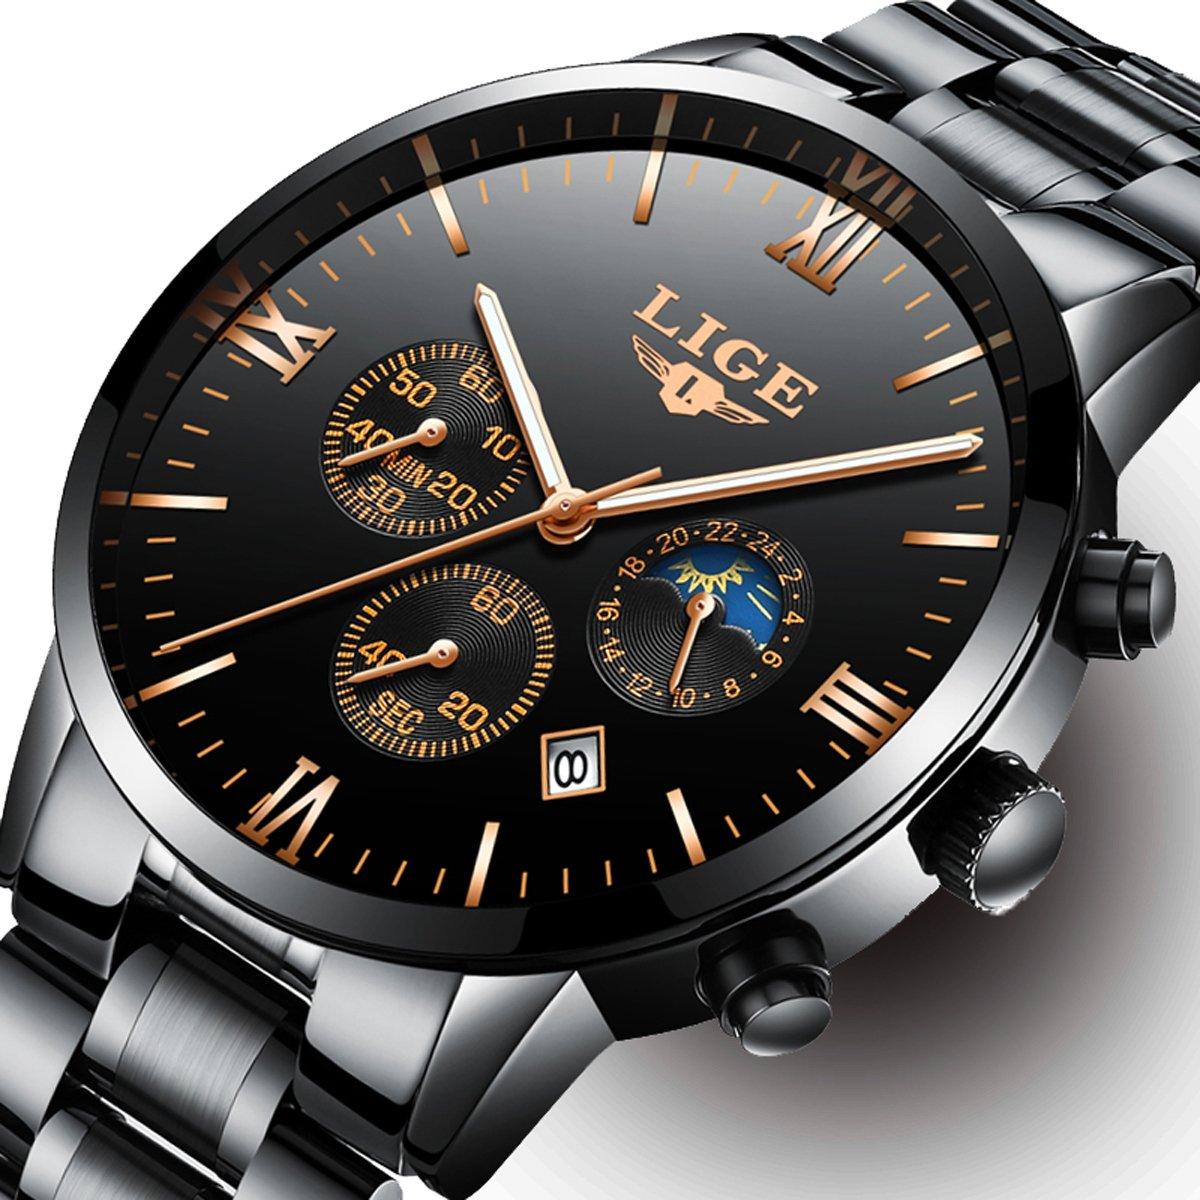 Mens Watches With Auto Date Chronograph Watch Men Sports Watches Waterproof 30M Full Steel Quartz Men's Black Watch